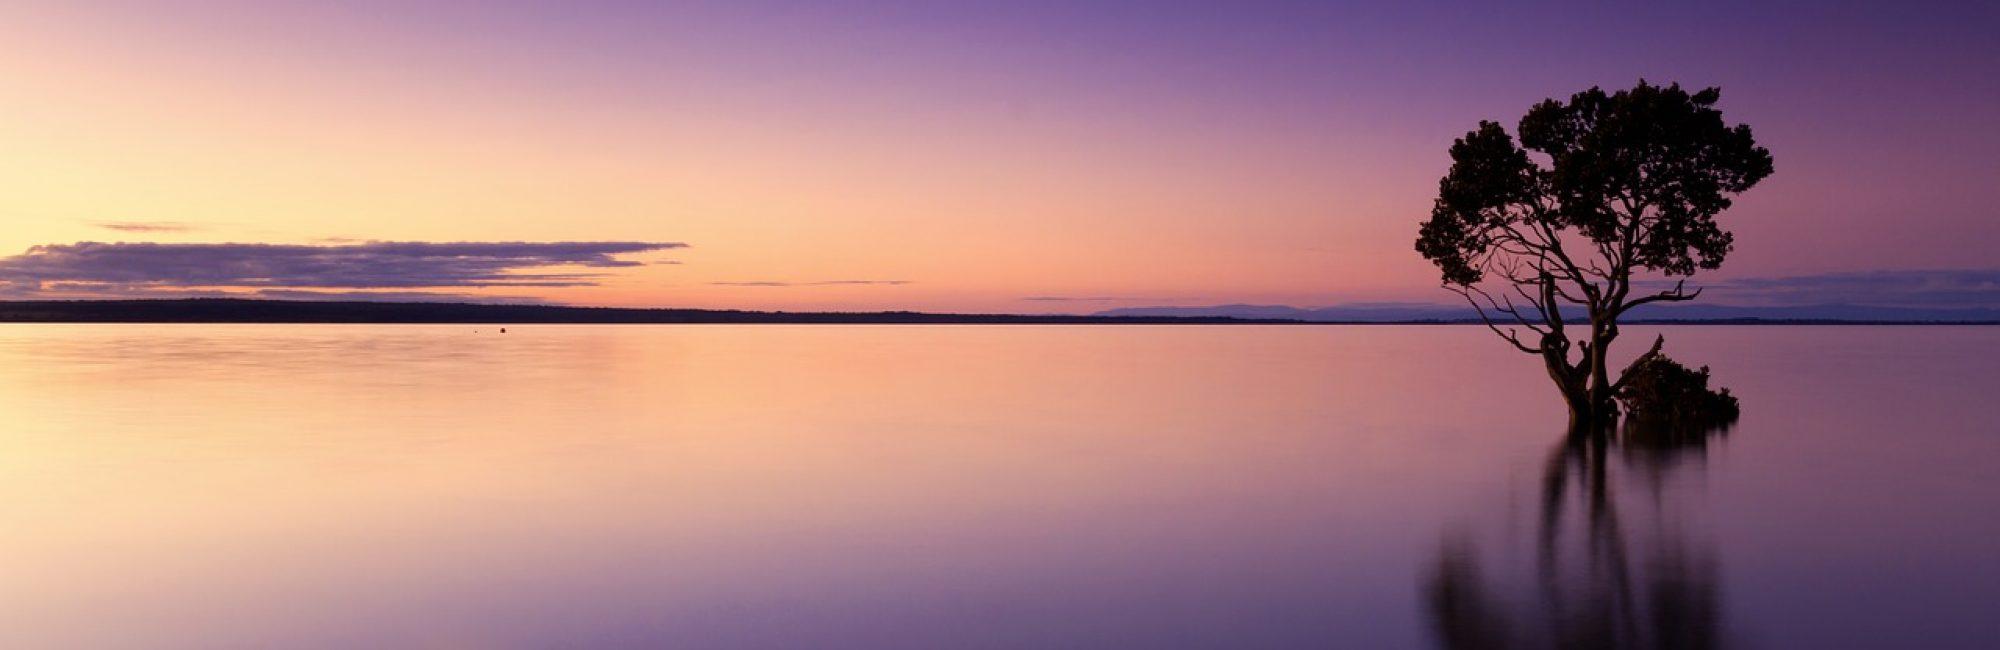 sunset-1373171_1280[1]